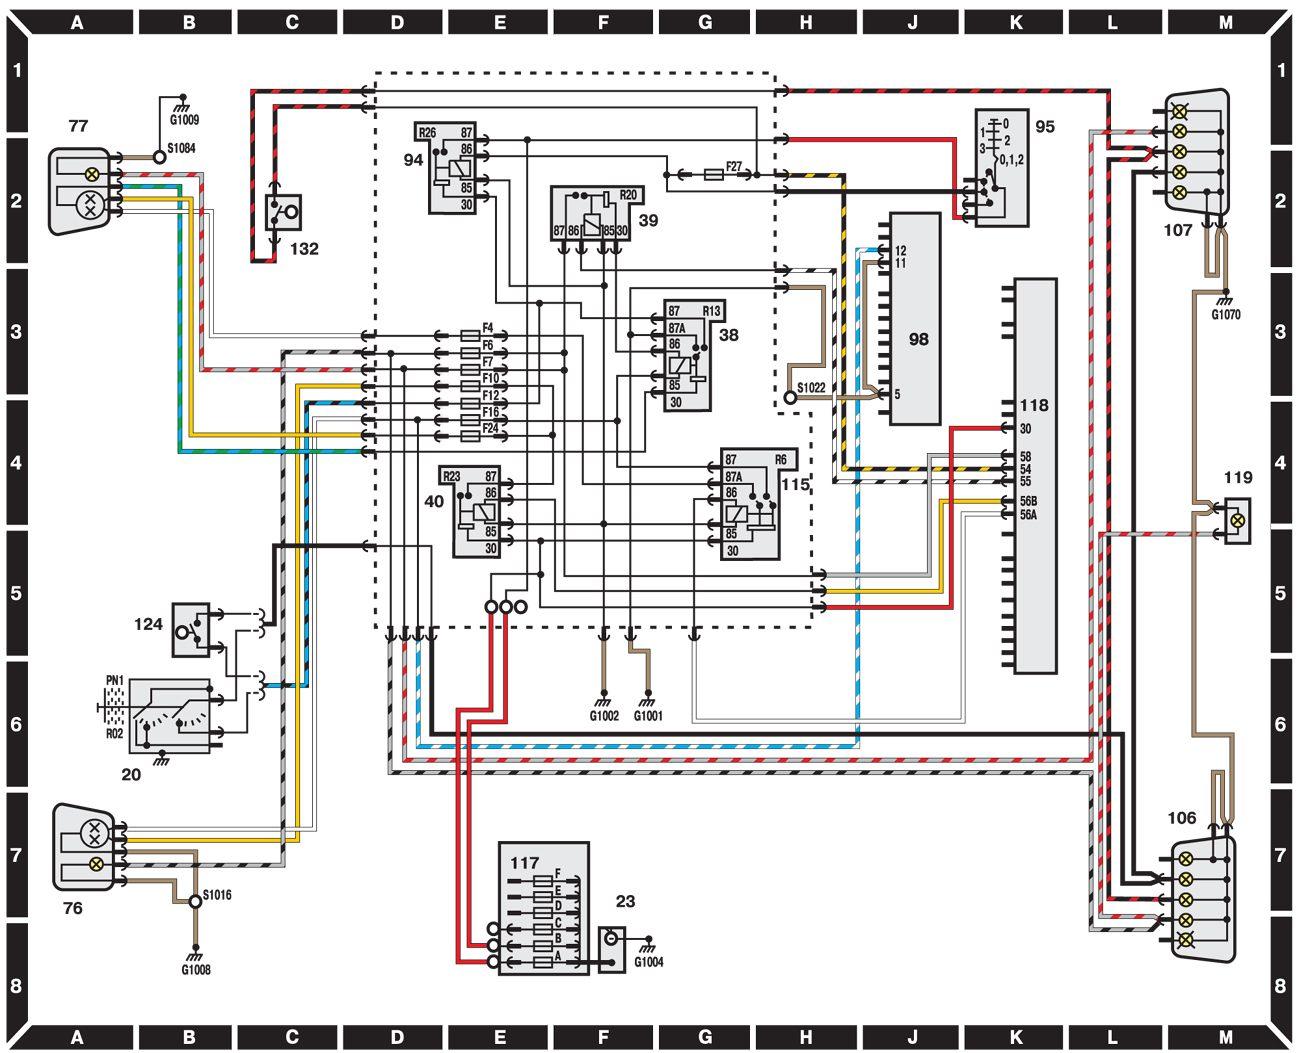 схема электропроводки форд сиера бензин 2 литра